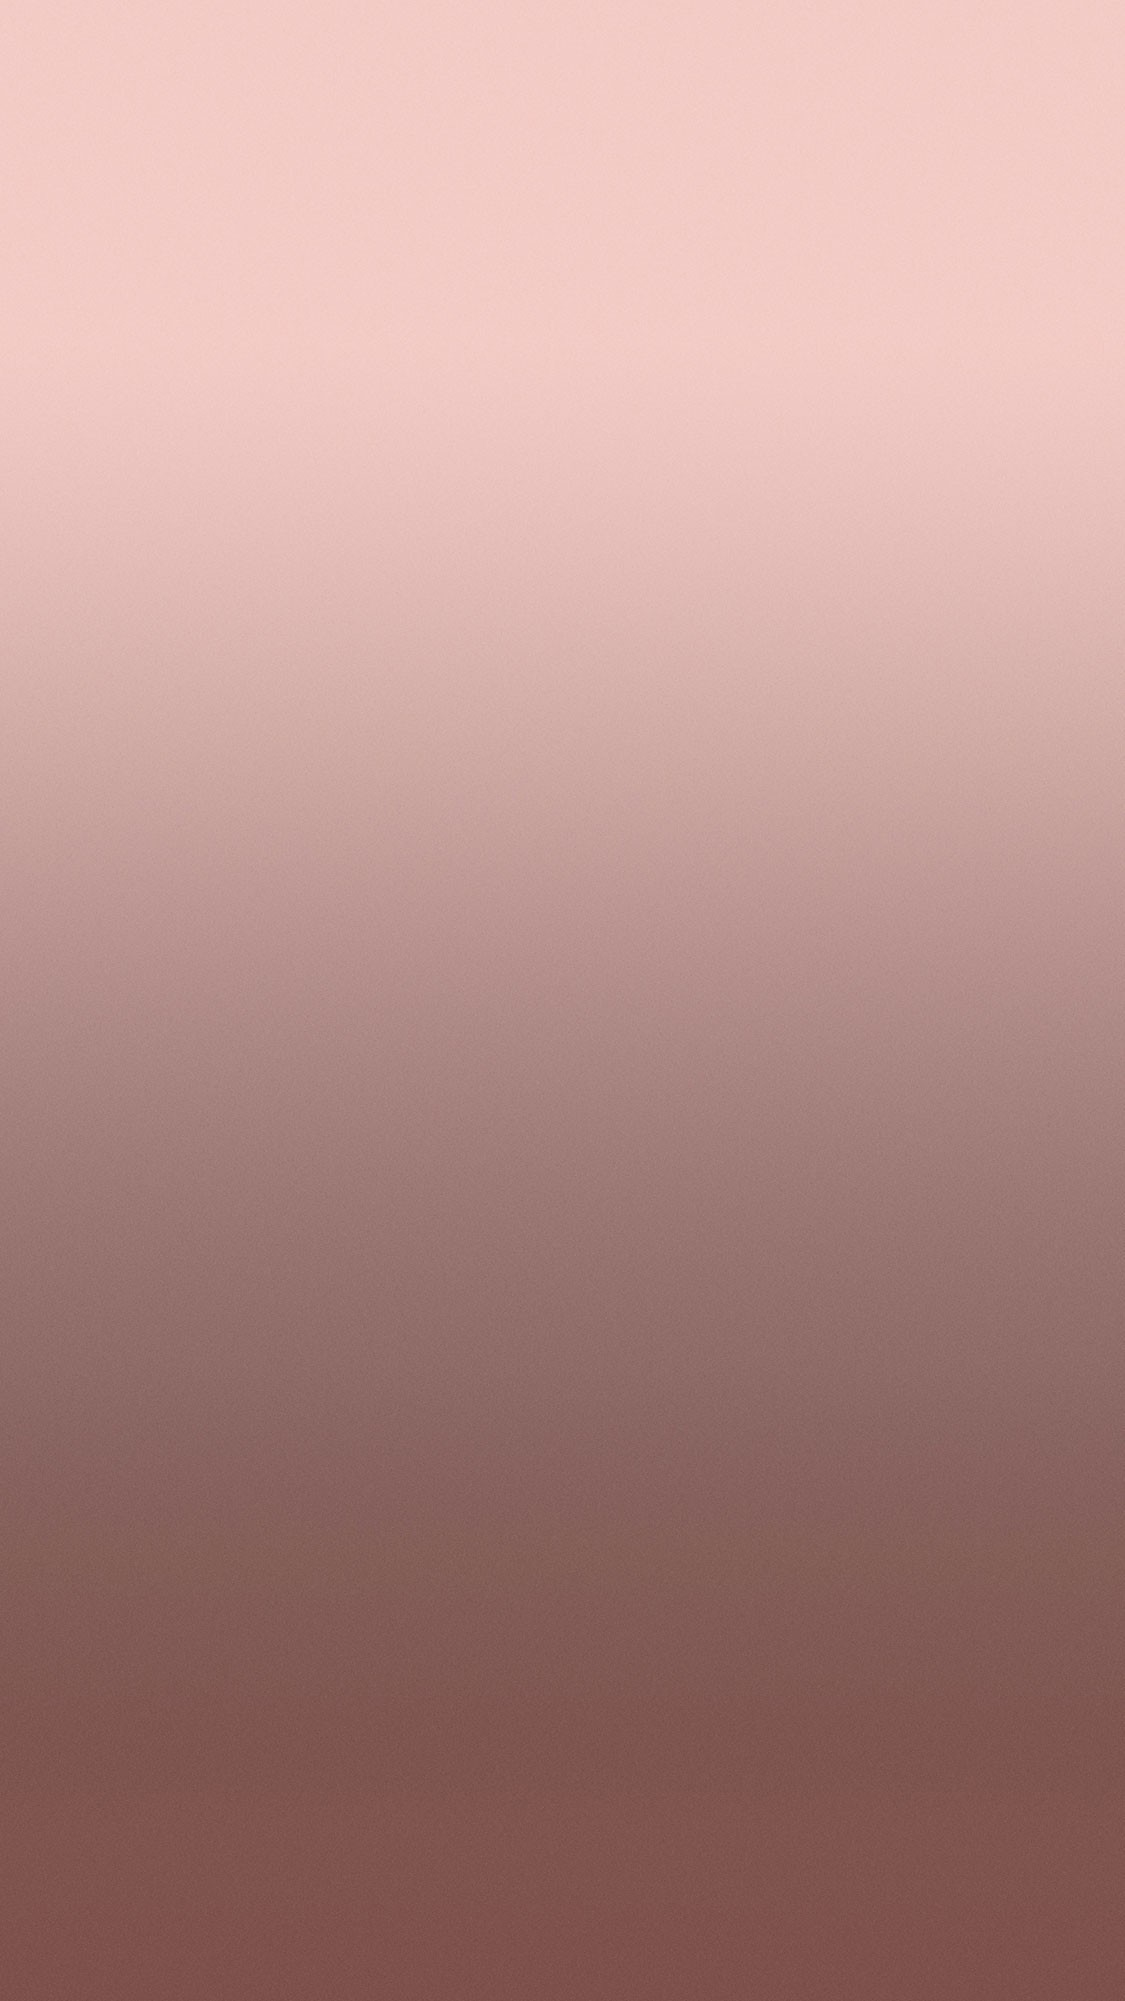 Rose Gold Wallpaper Download Free Amazing Full Hd